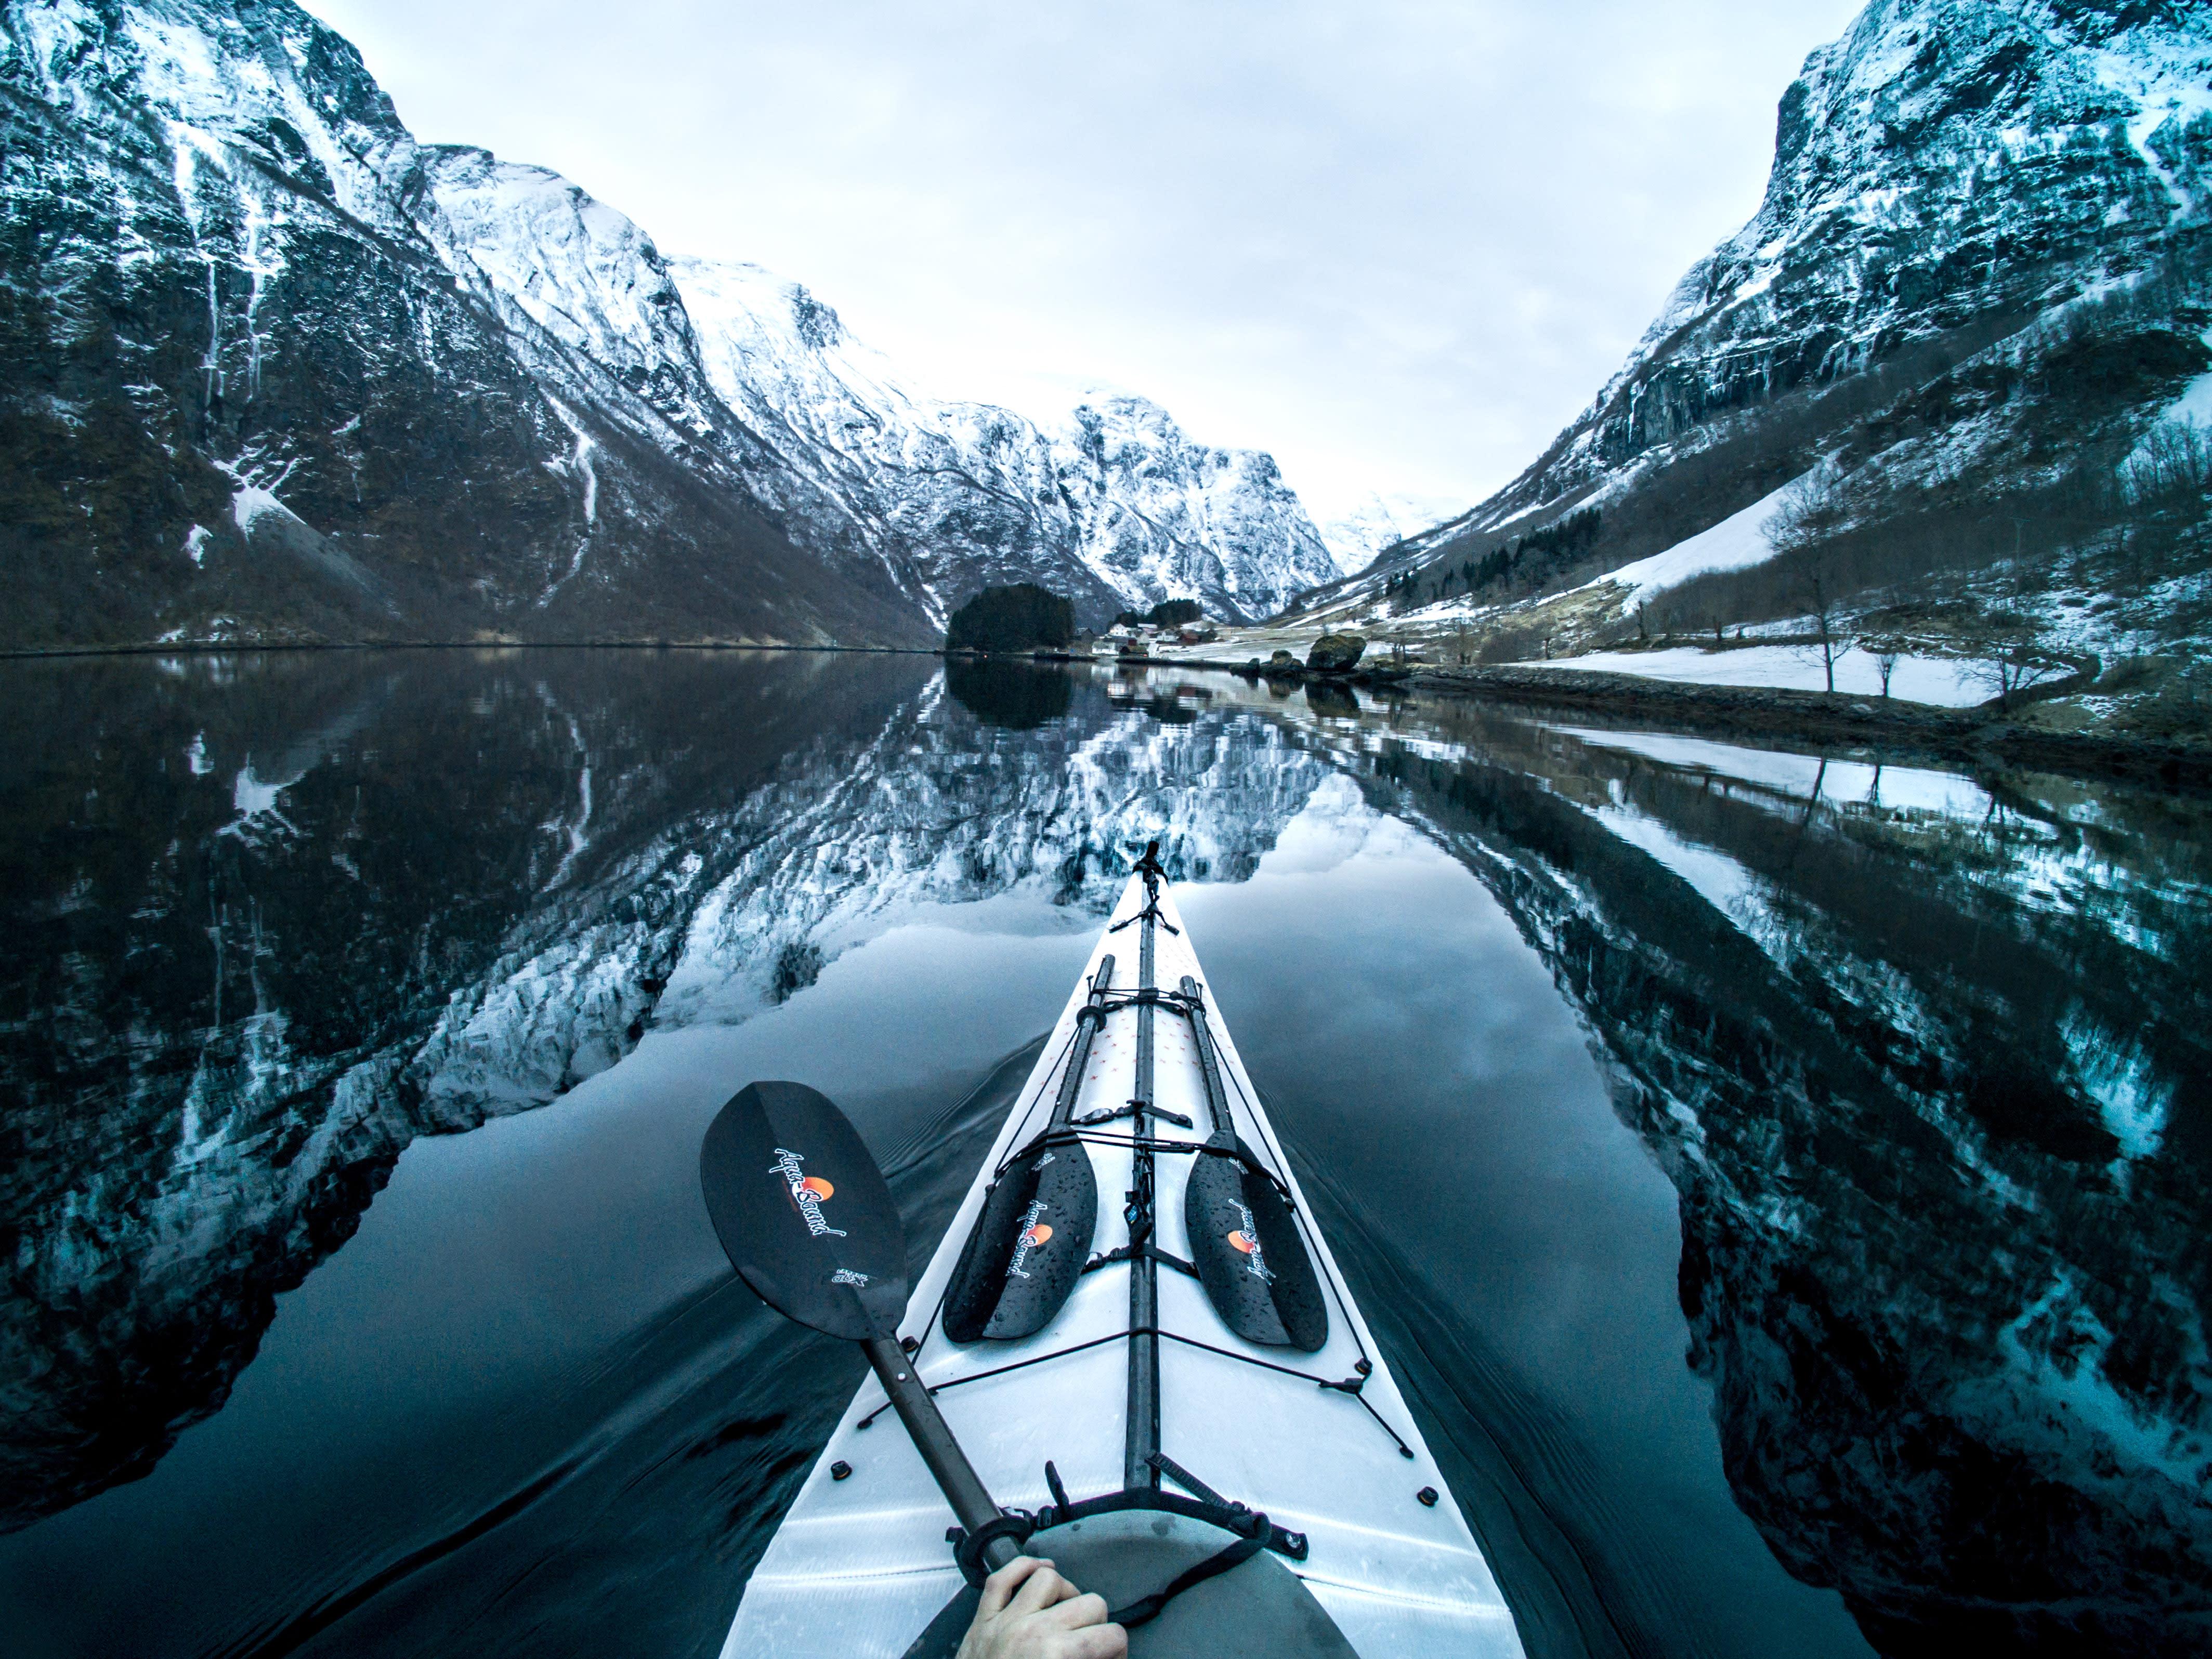 <p>Village of Bakka seen from Nryfjorden, Norway. (Photo: Tomasz Furmanek/Caters News) </p>